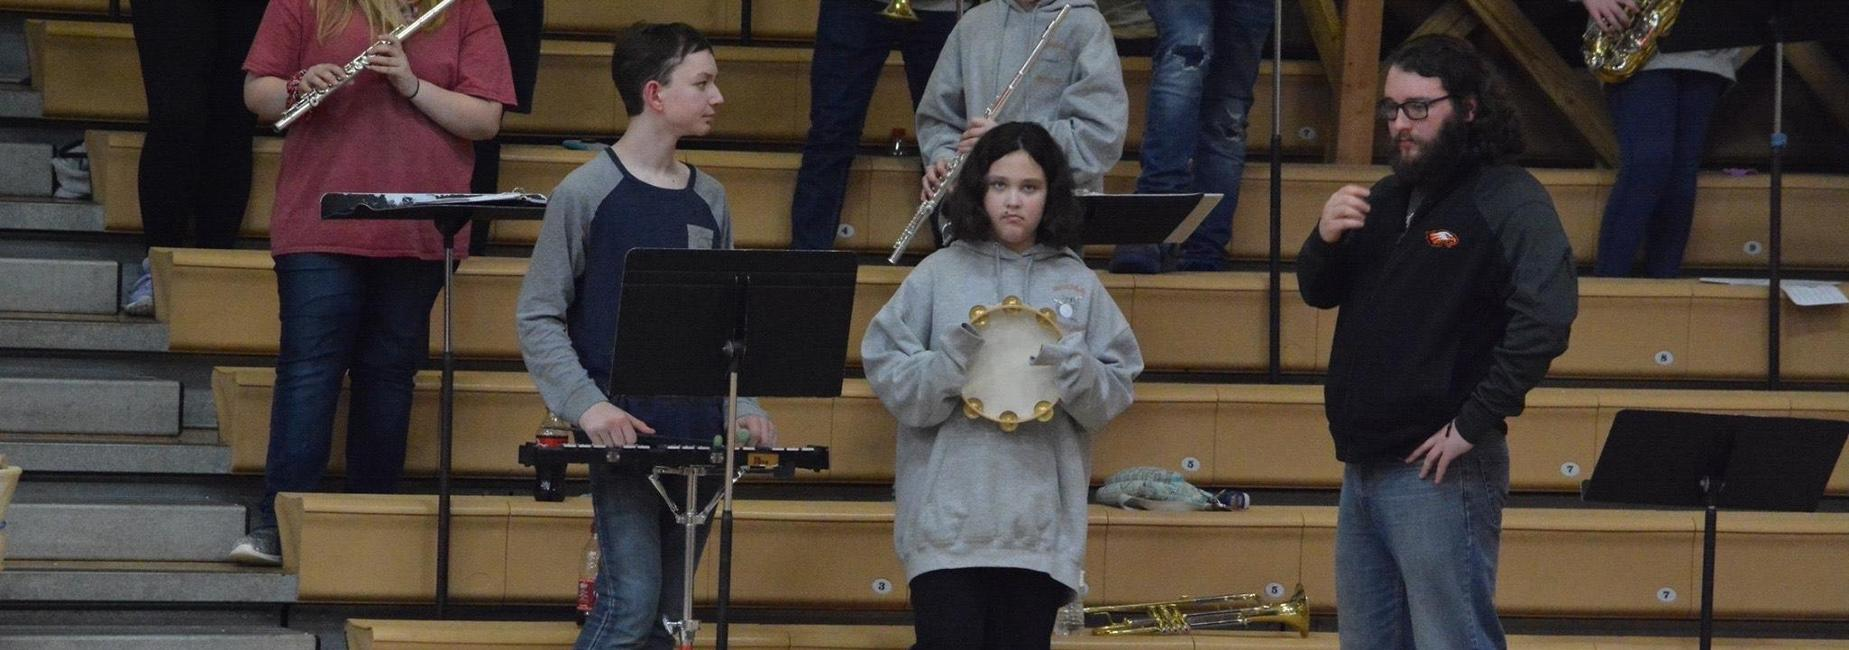 Bradford Band